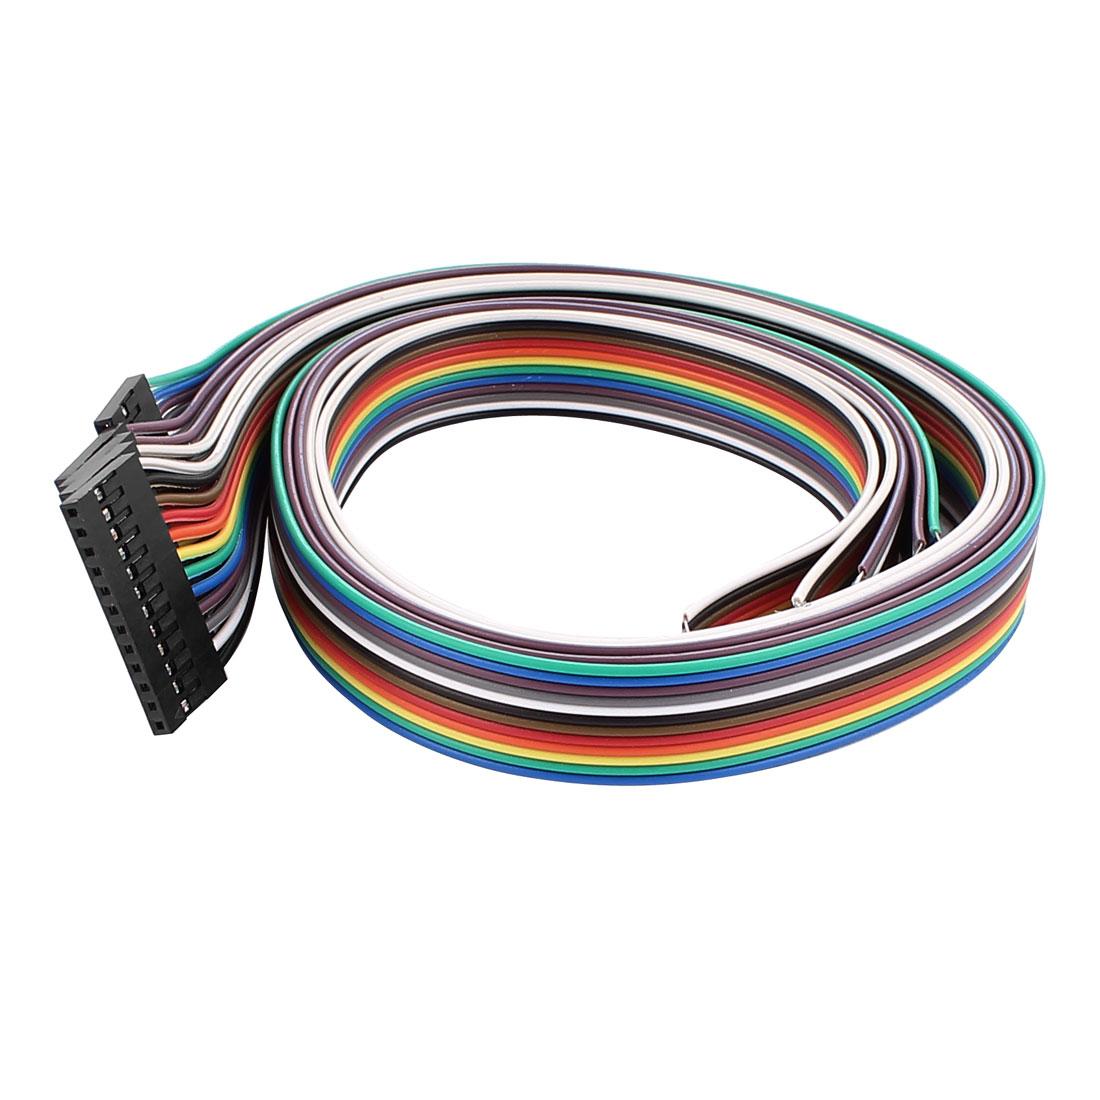 5 Pcs Female 12P Jumper Wires Ribbon Cables Pi Pic Breadboard DIY 50cm Long